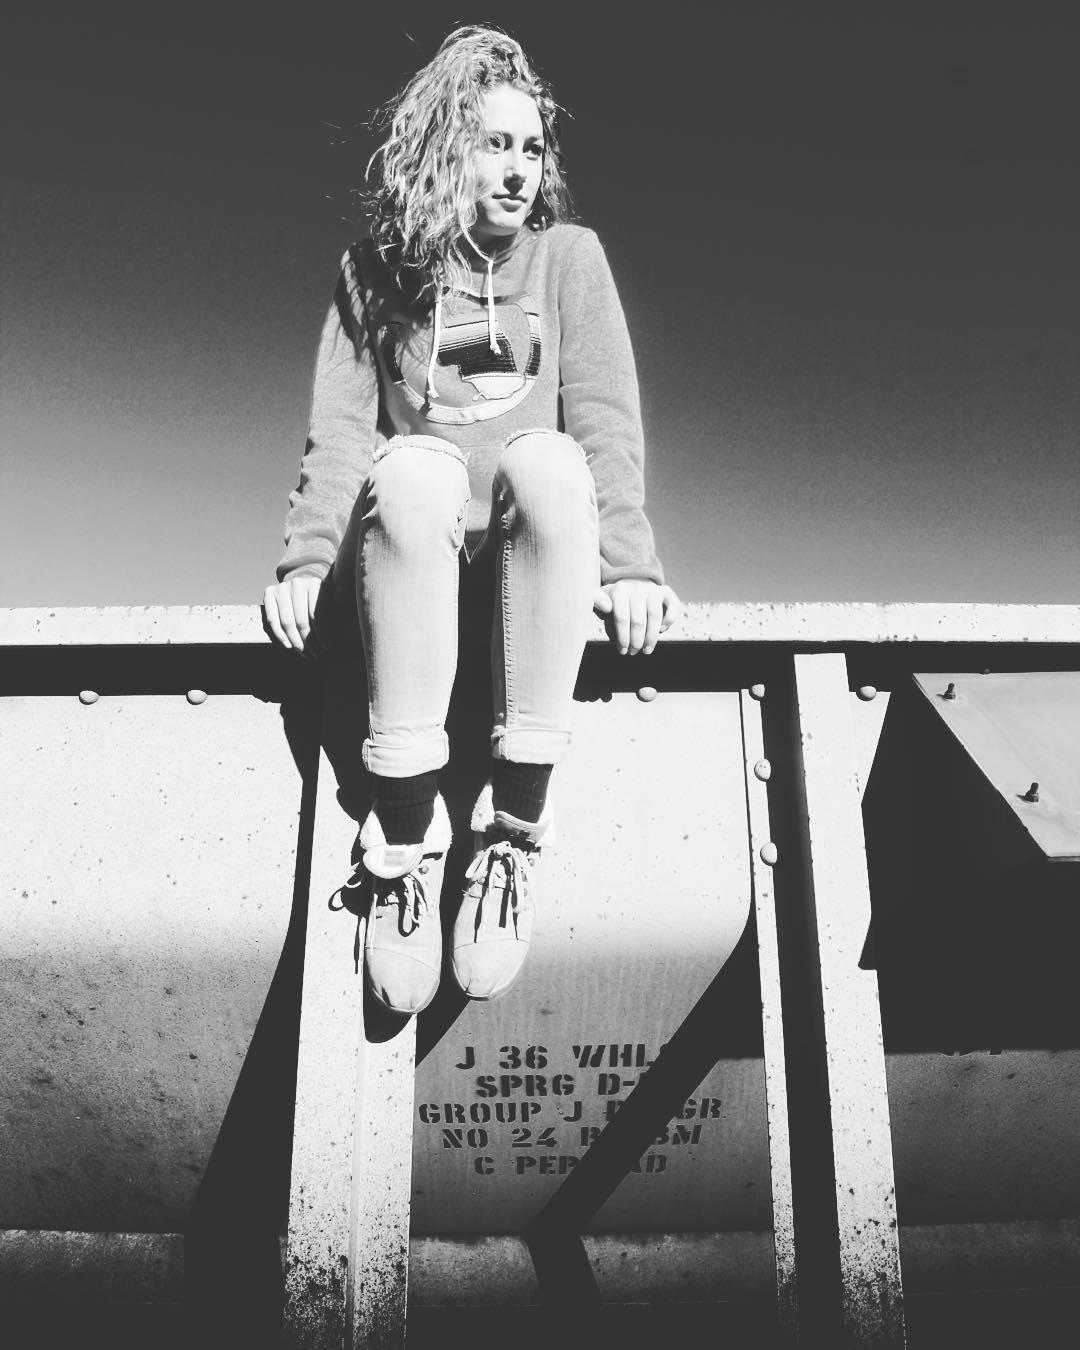 That hair, @kellalti. P: @demetrisavas  _ #tahoemade #thisistahoe